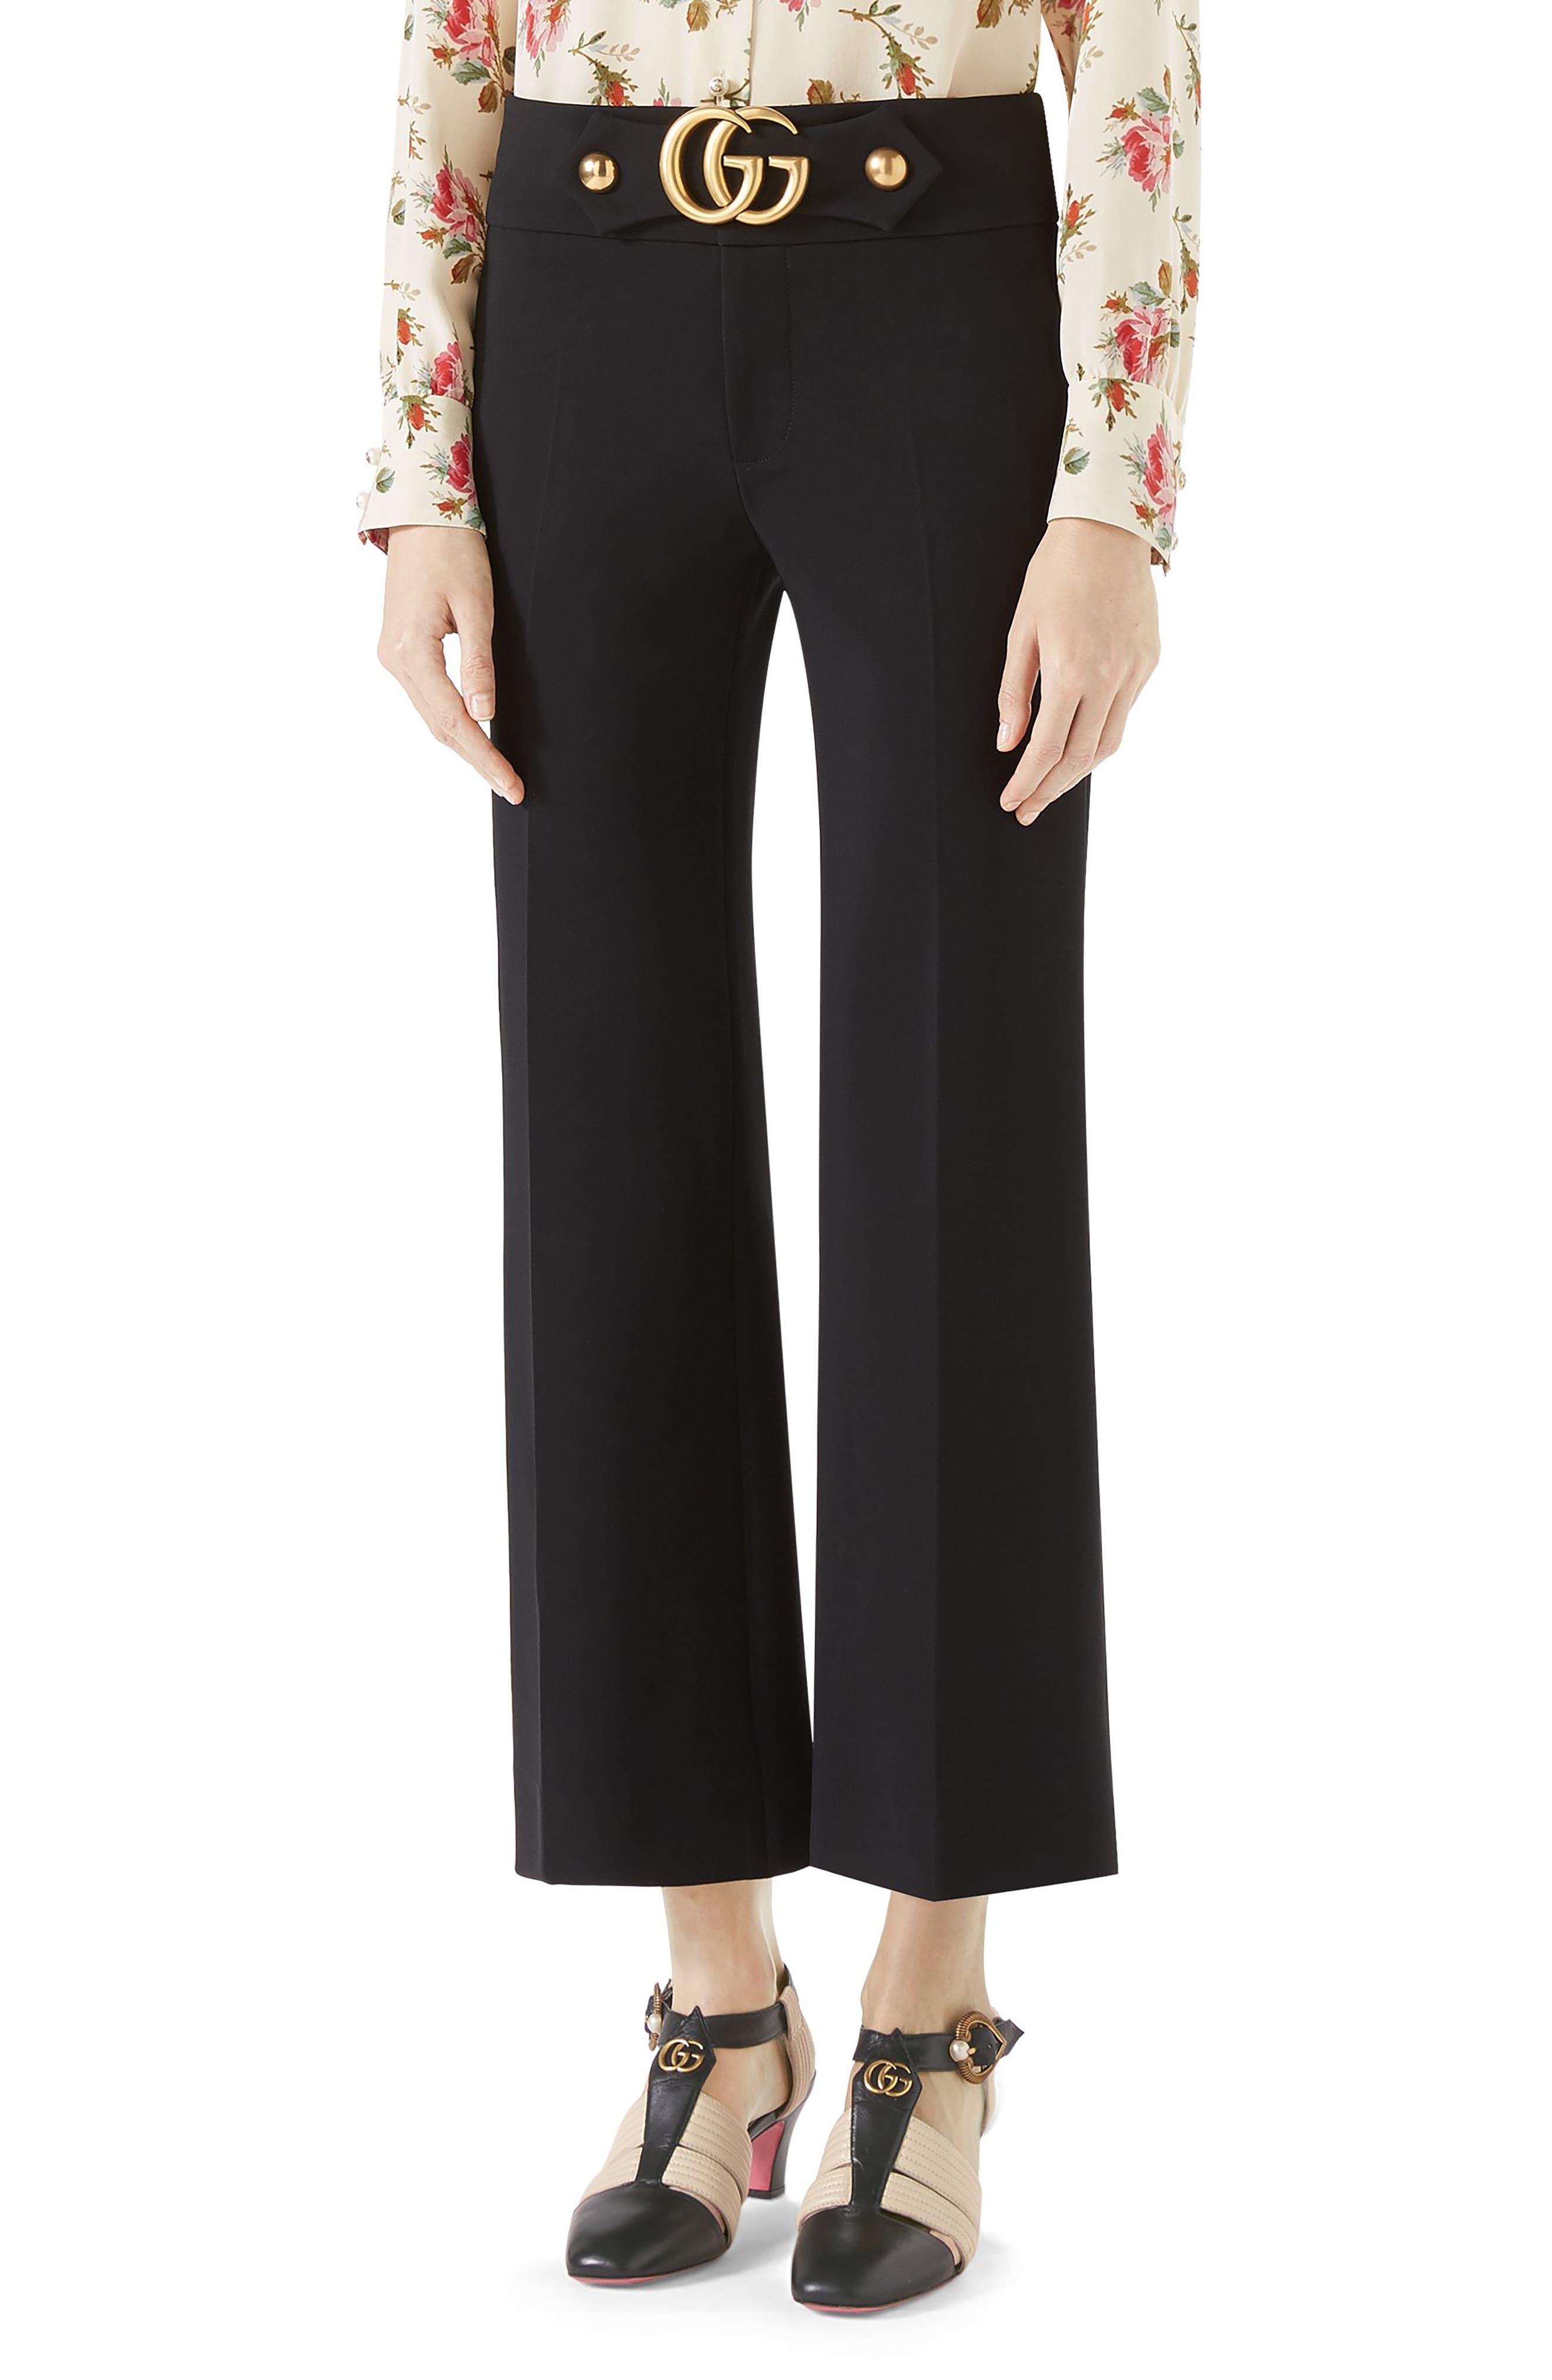 Marmont Stretch Jersey Crop Pants,                             Main thumbnail 1, color,                             BLACK